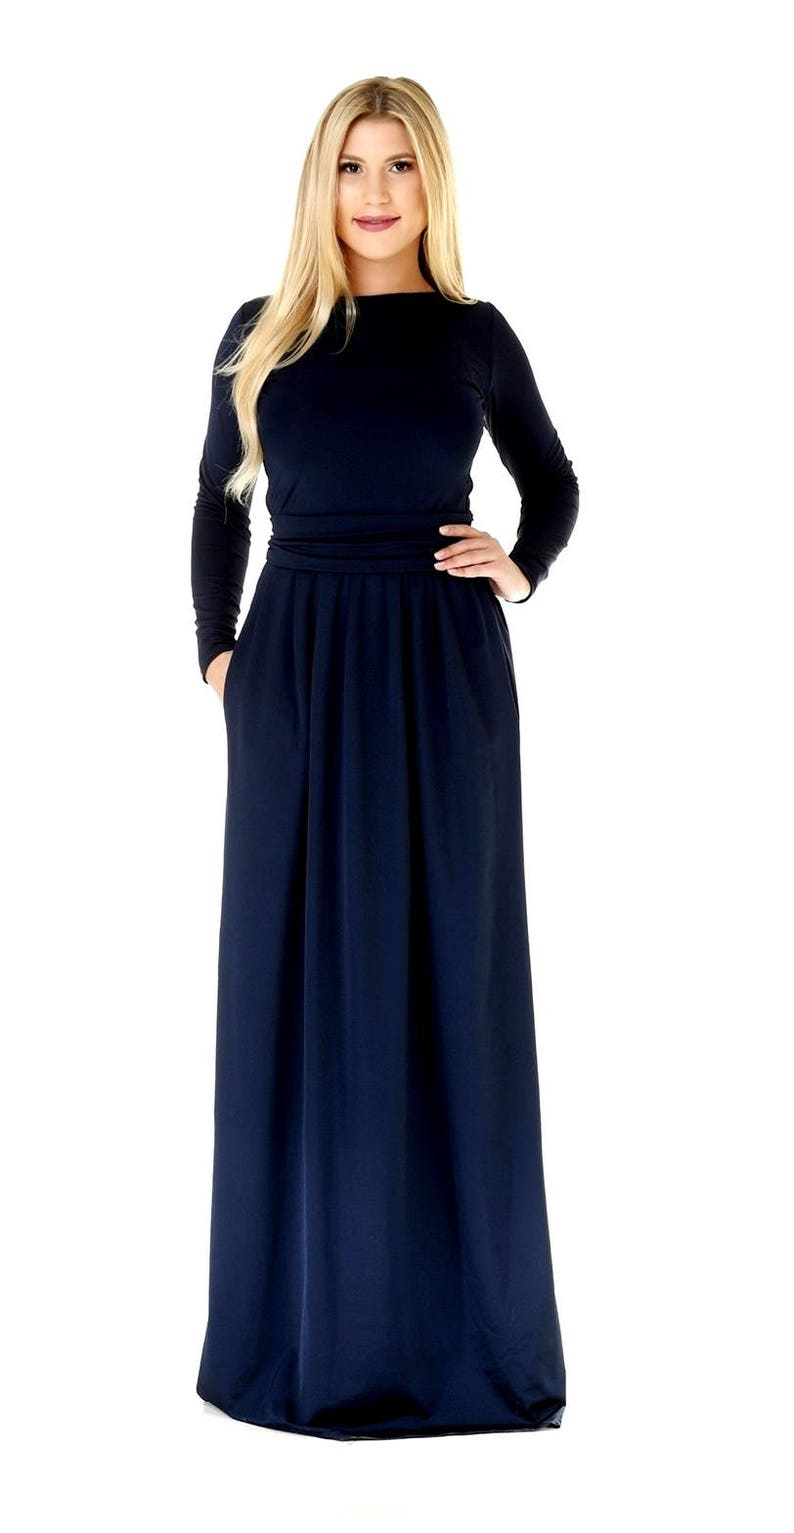 5bf54391dc0 Navy Blue Maxi Dress/ Long Sleeves Dress With Pockets Sash   Etsy